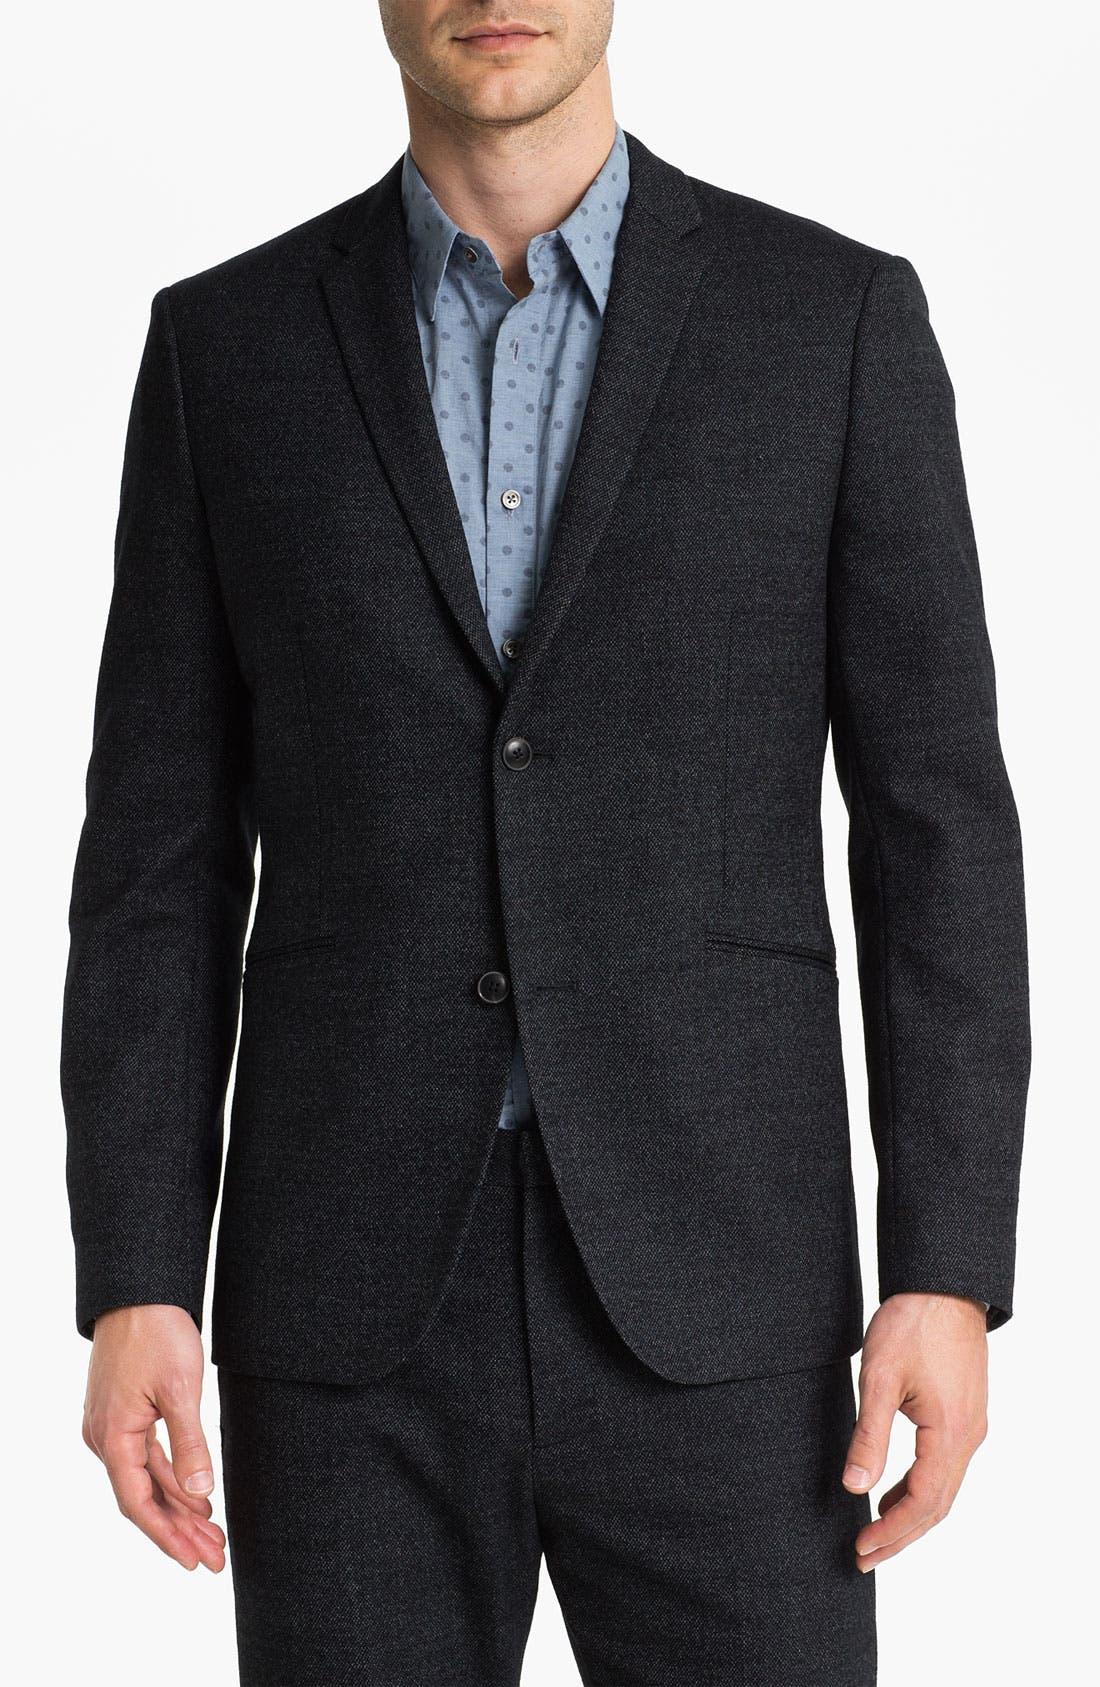 Main Image - Theory 'Rodolf Wolcott' Wool Blend Tweed Blazer